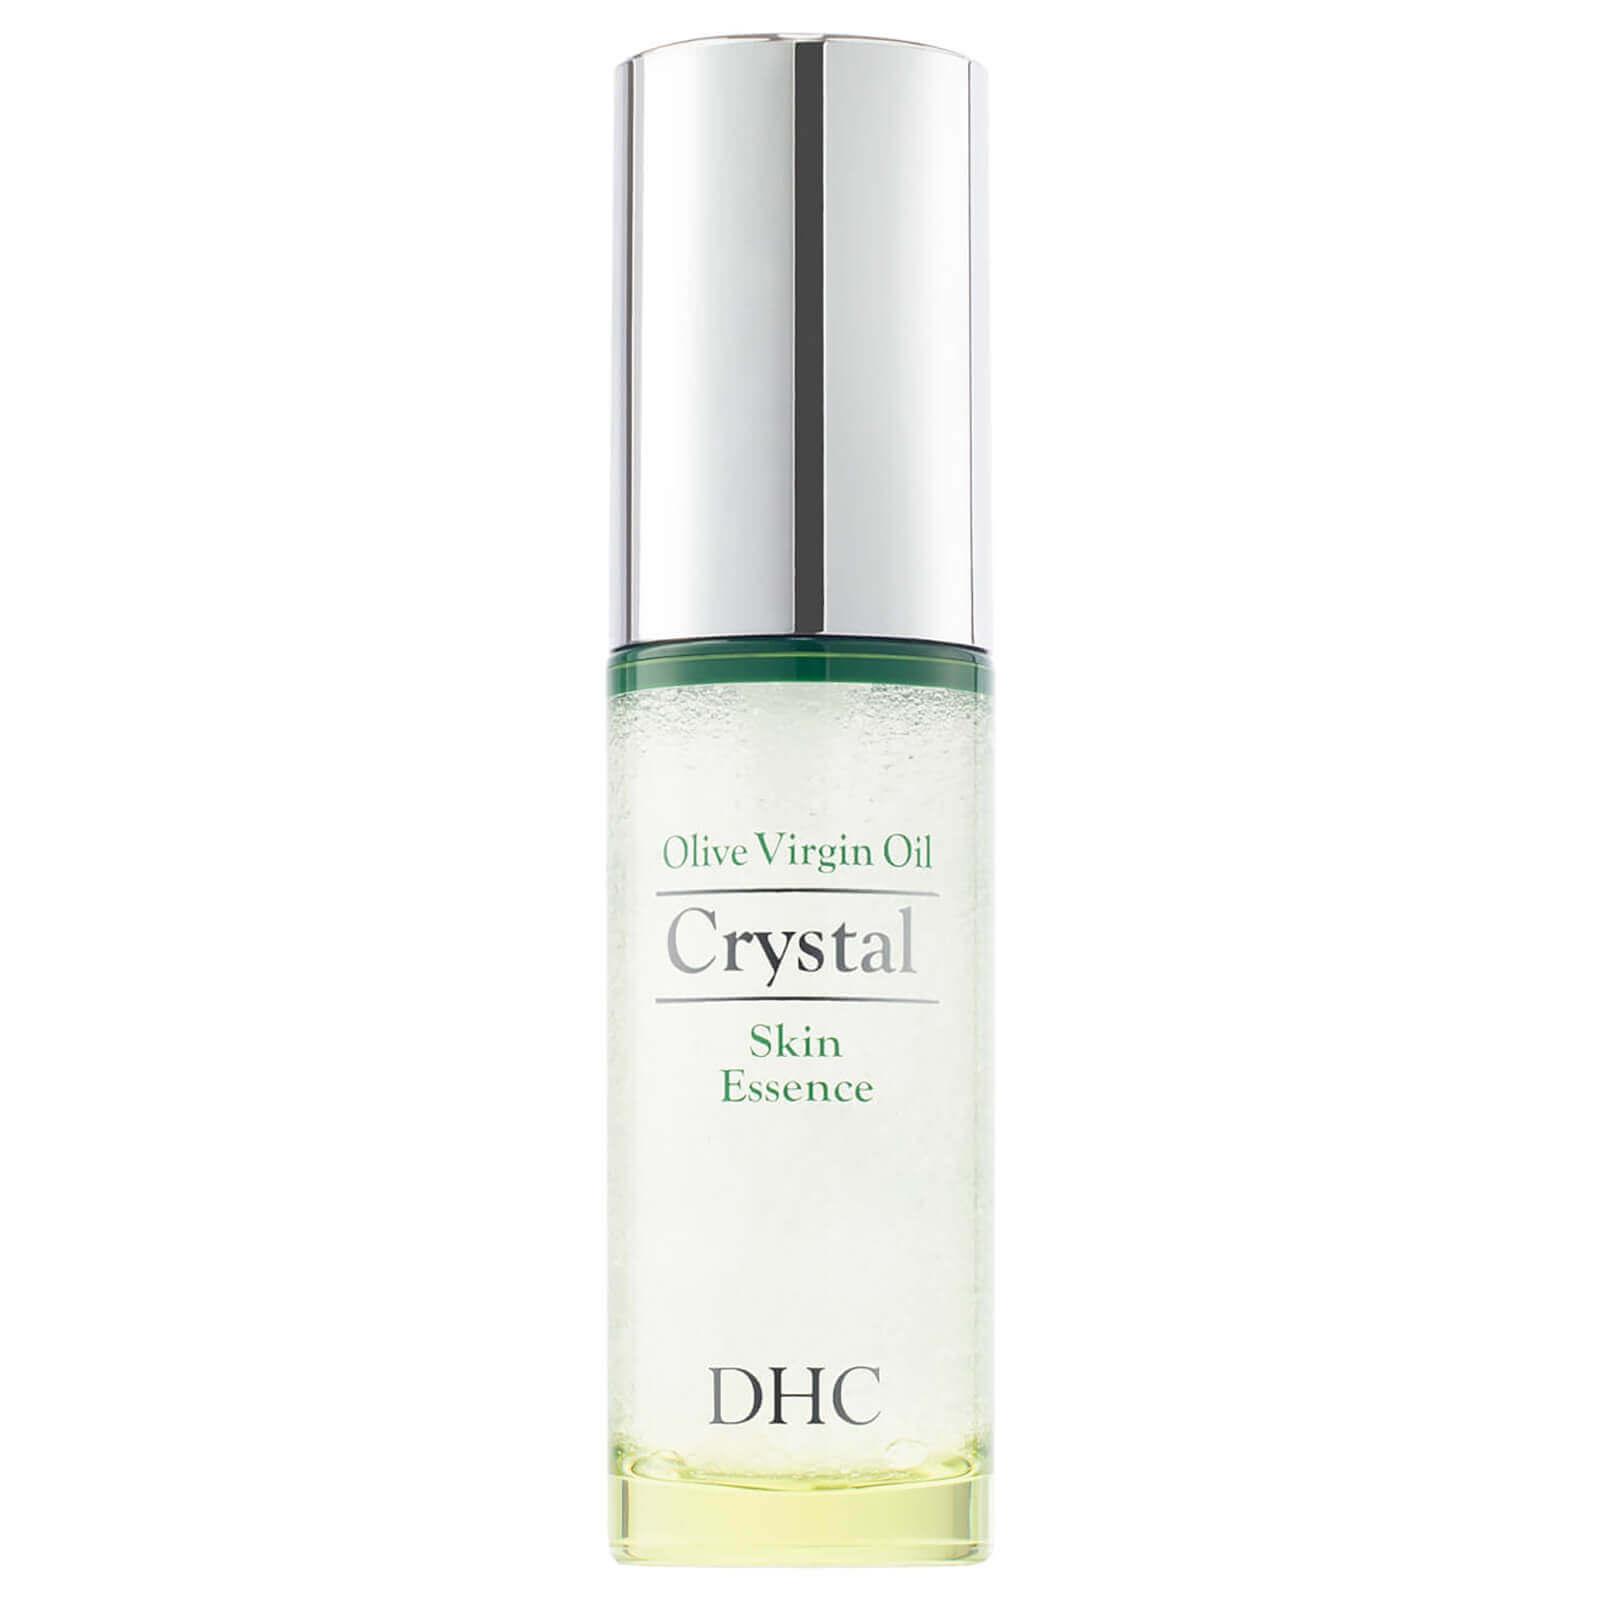 Olive Virgin Oil Crystal Skin Essence 50ml